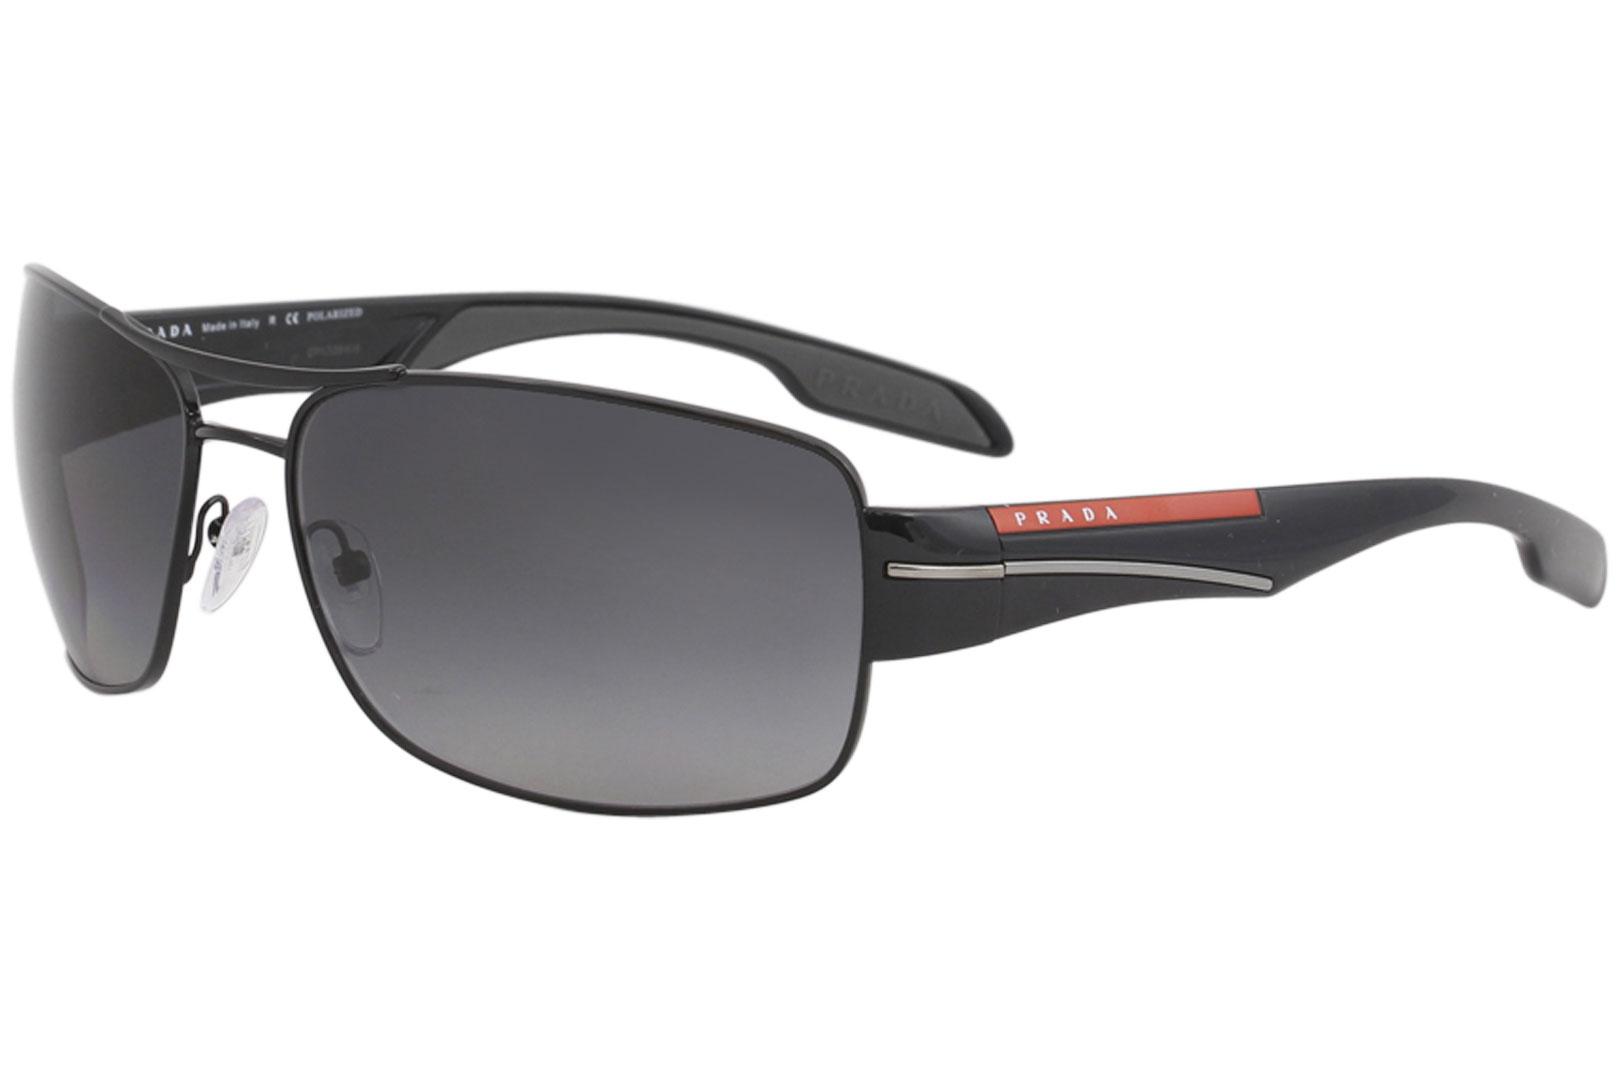 a1162885ae Details about Prada Linea Rossa SPS53N SPS 53N 7AX 5W1 Black Pilot Polarized  Sunglasses 65mm